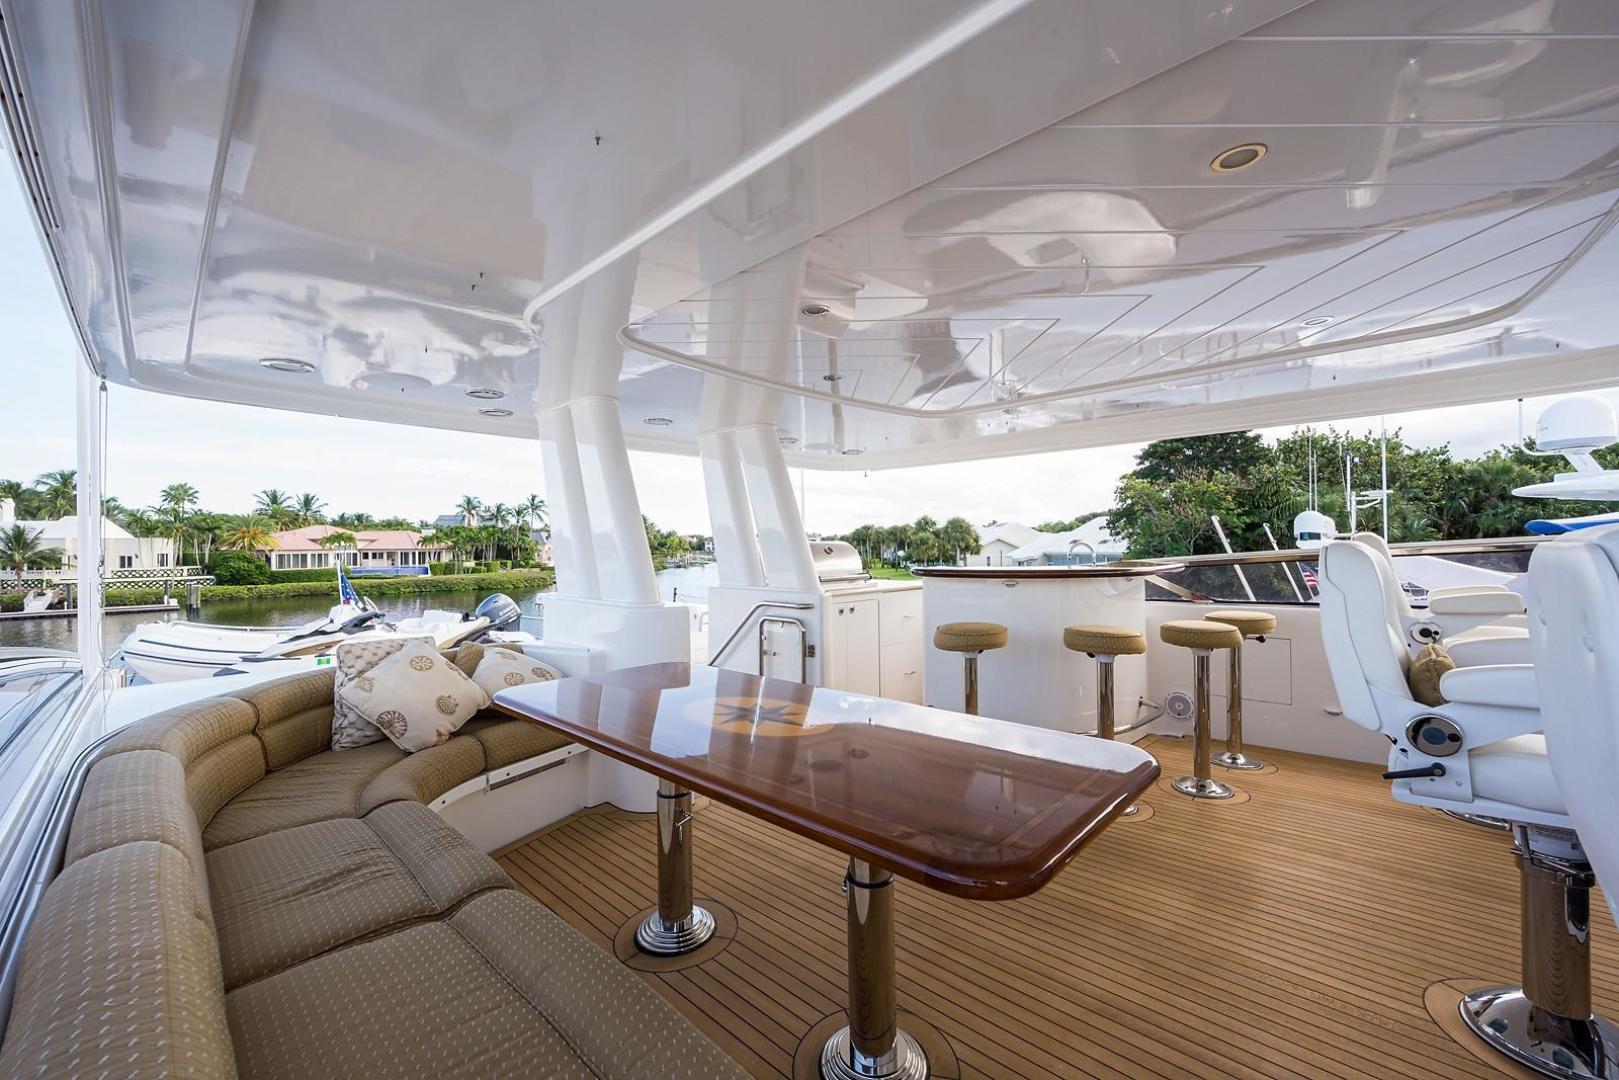 Westport-Motoryacht 2010-Cavallino Fort Lauderdale-Florida-United States-Flybridge/Seating-1270115 | Thumbnail